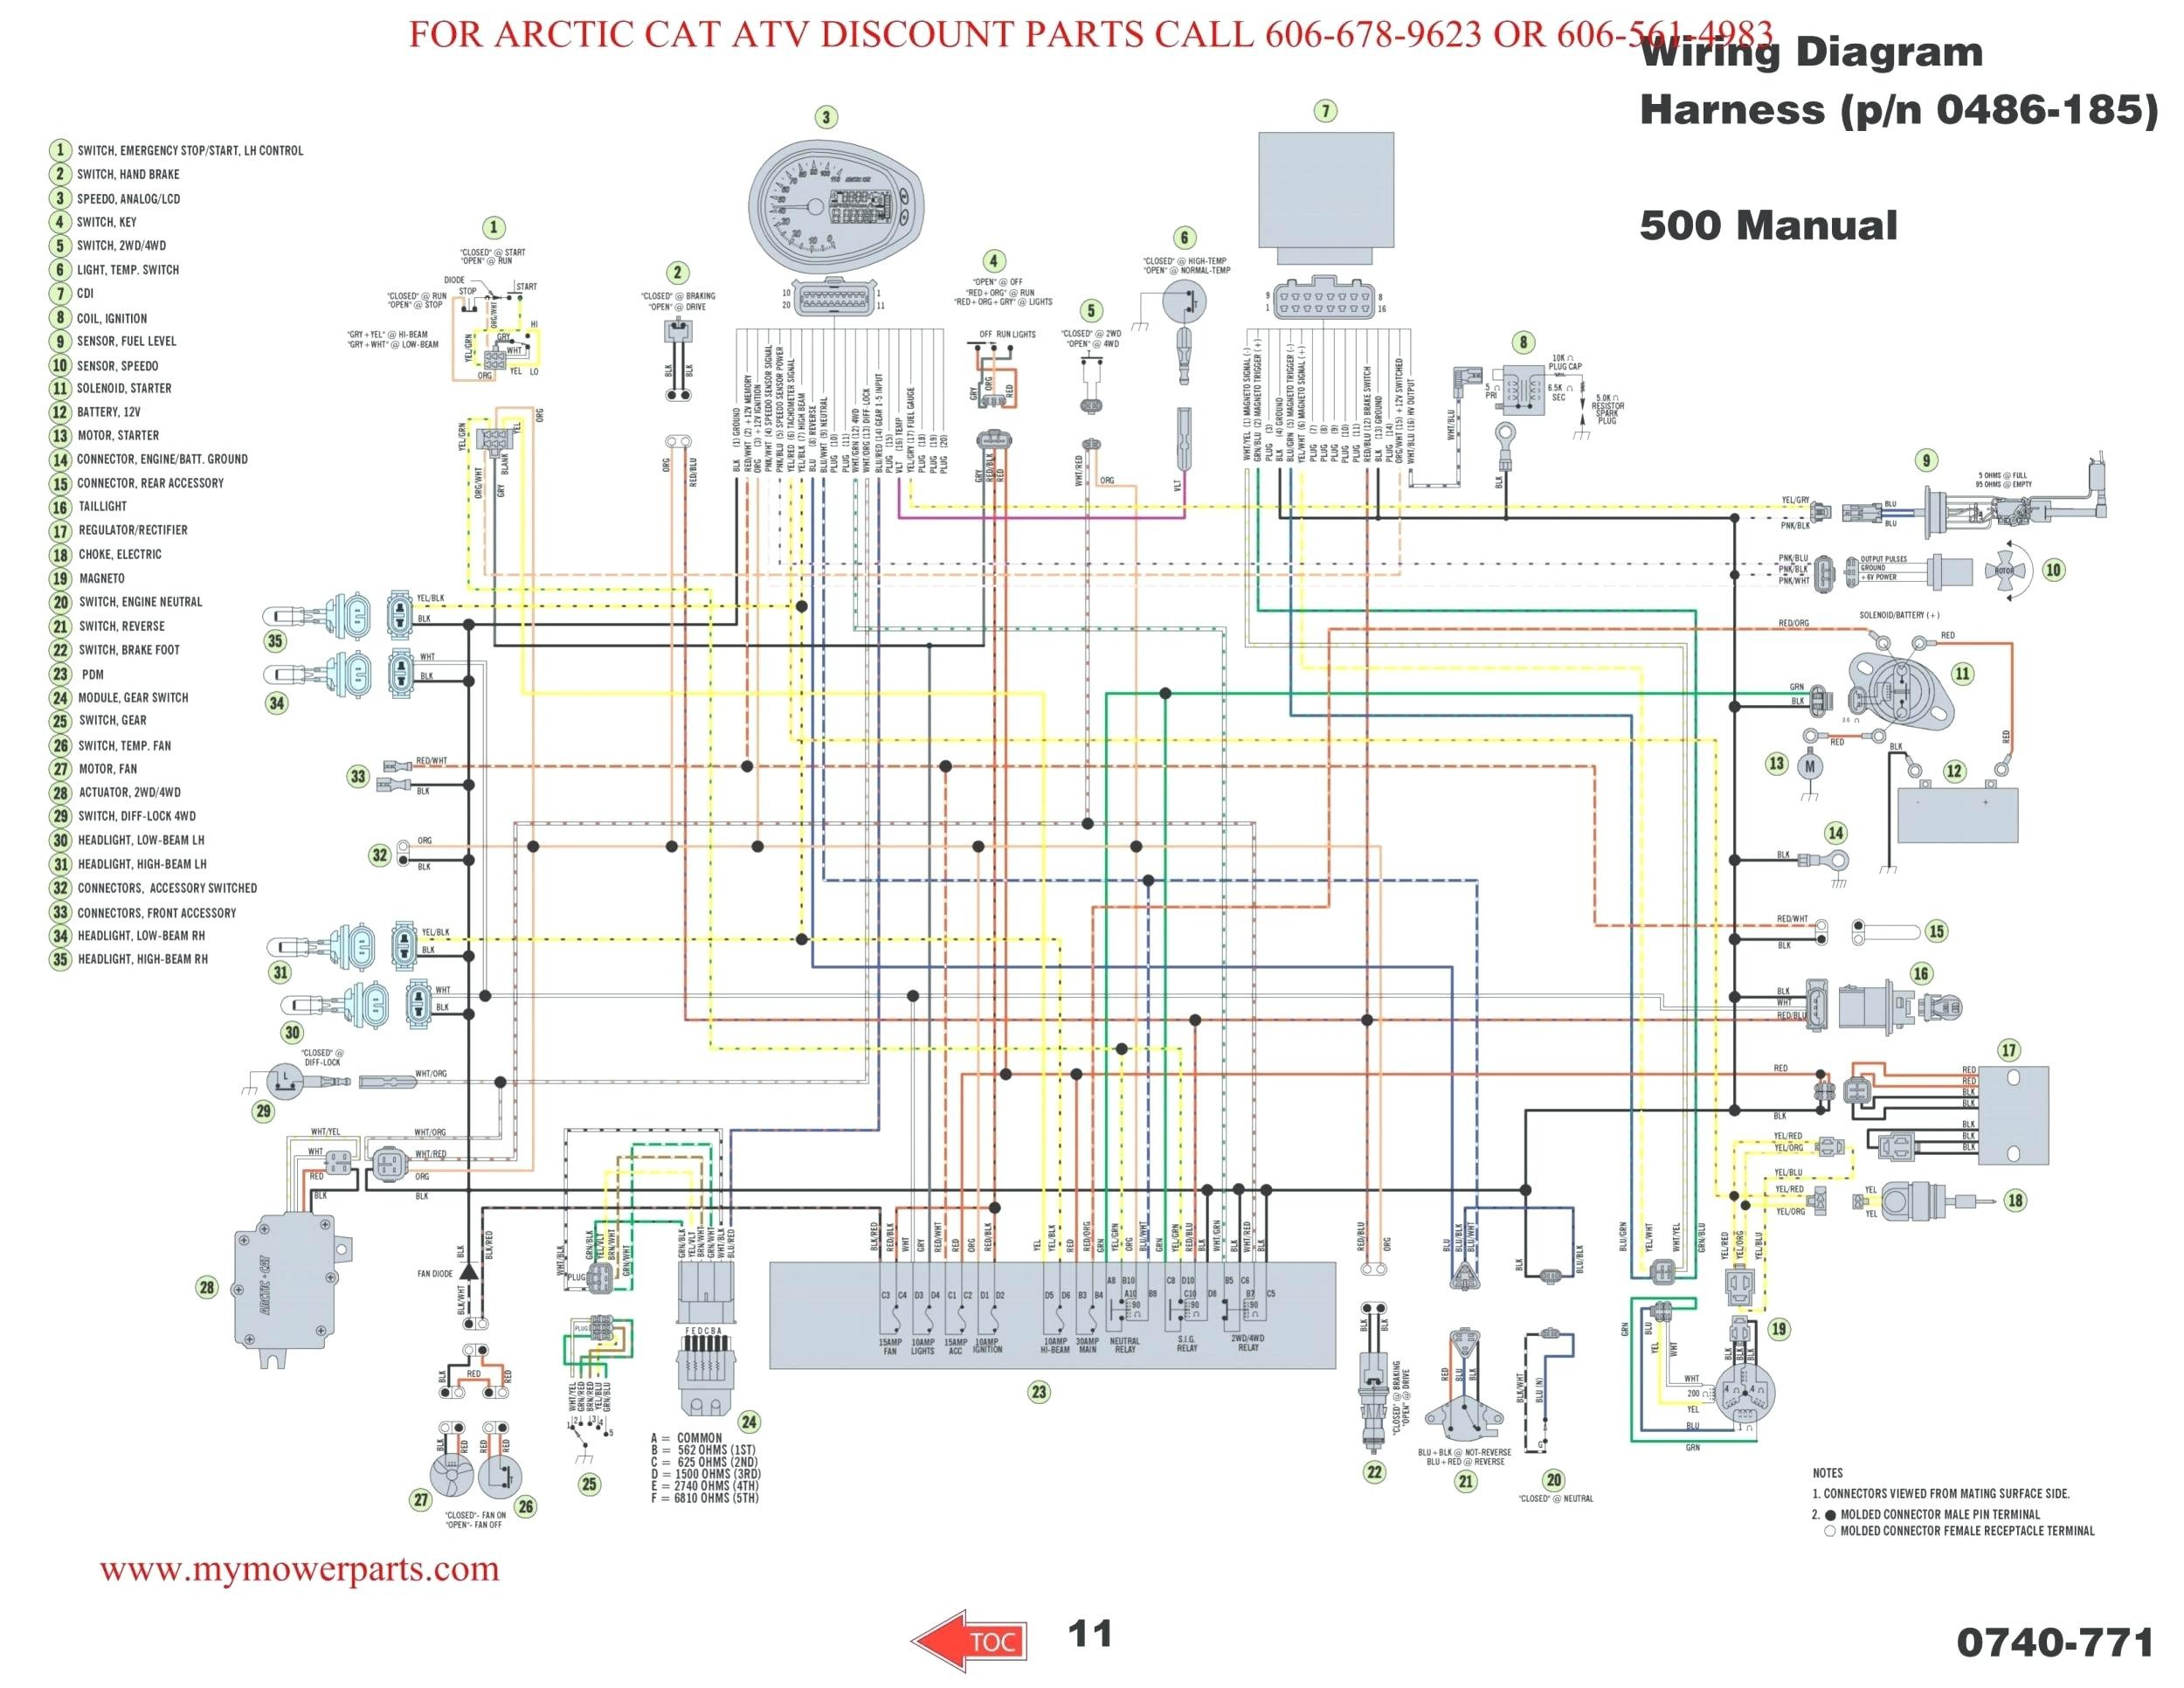 Ford 8n 12 Volt Conversion Wiring Diagram Best Wonderful Ford 8n